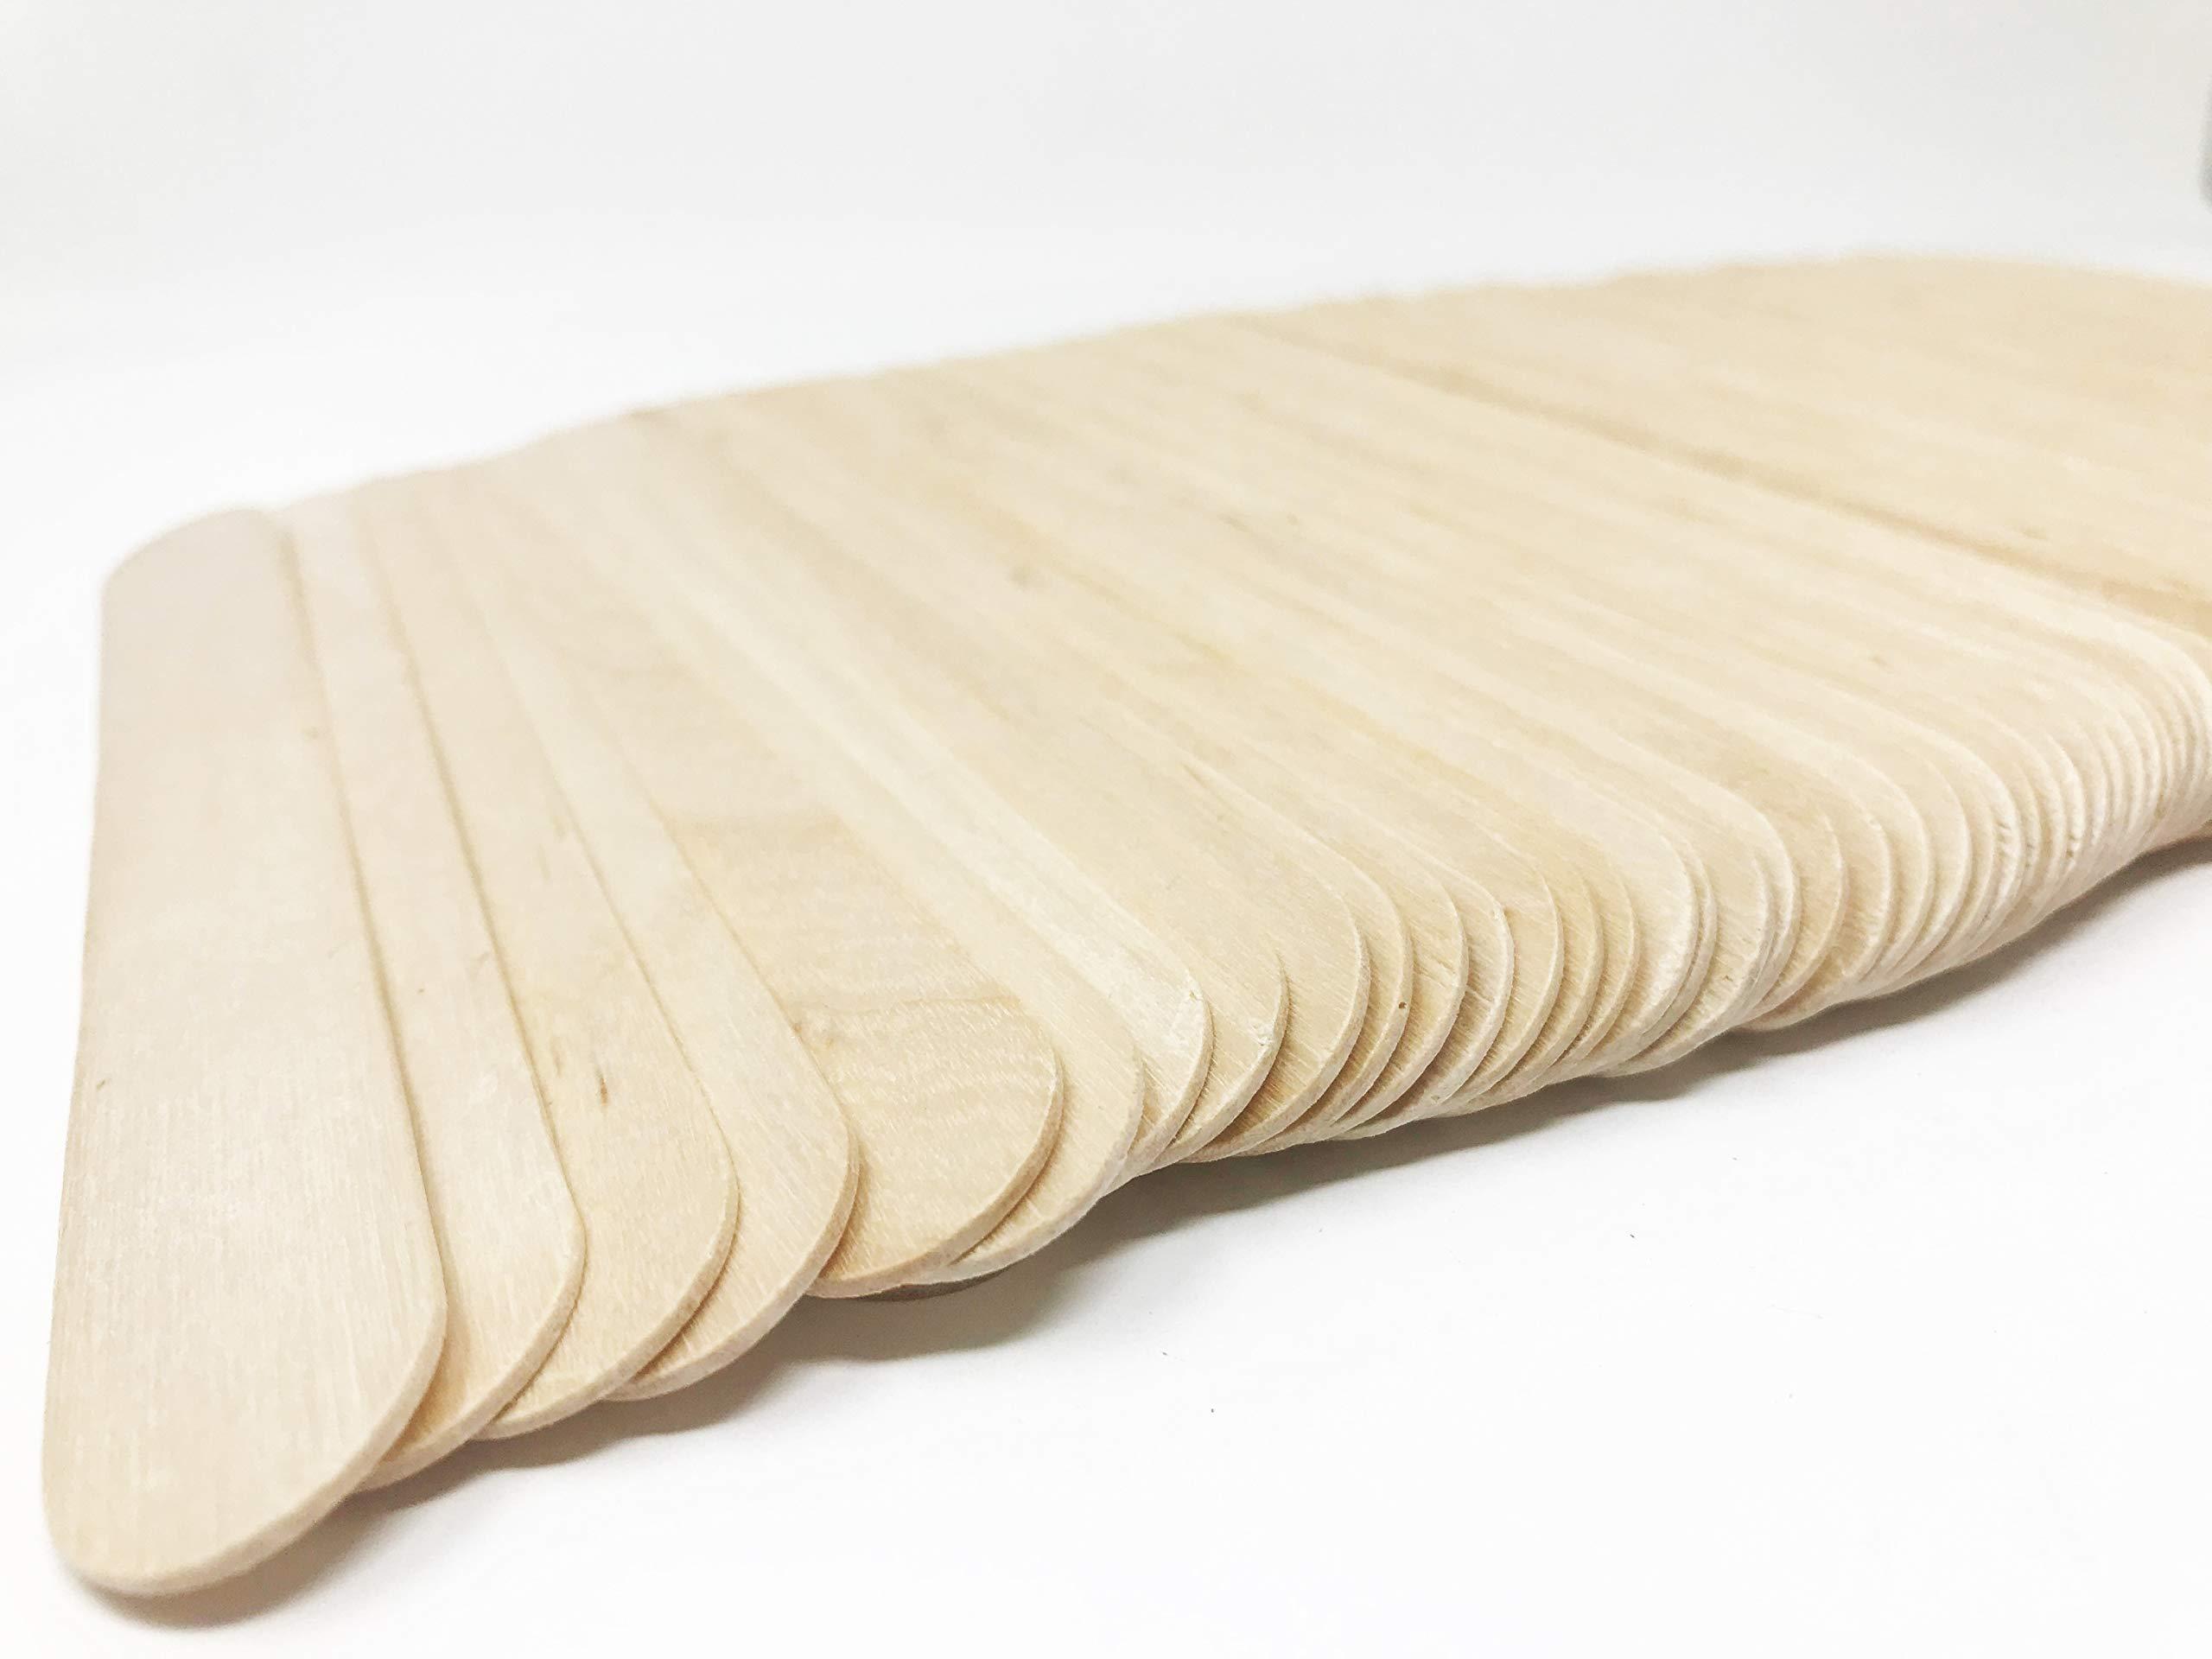 Tongue Depressors Non-STERILE Standard Size 6''x0.75'', Premium Natural Birch Wood Craft Sticks (2500 PCS (5 BX)) by Starryshine (Image #2)